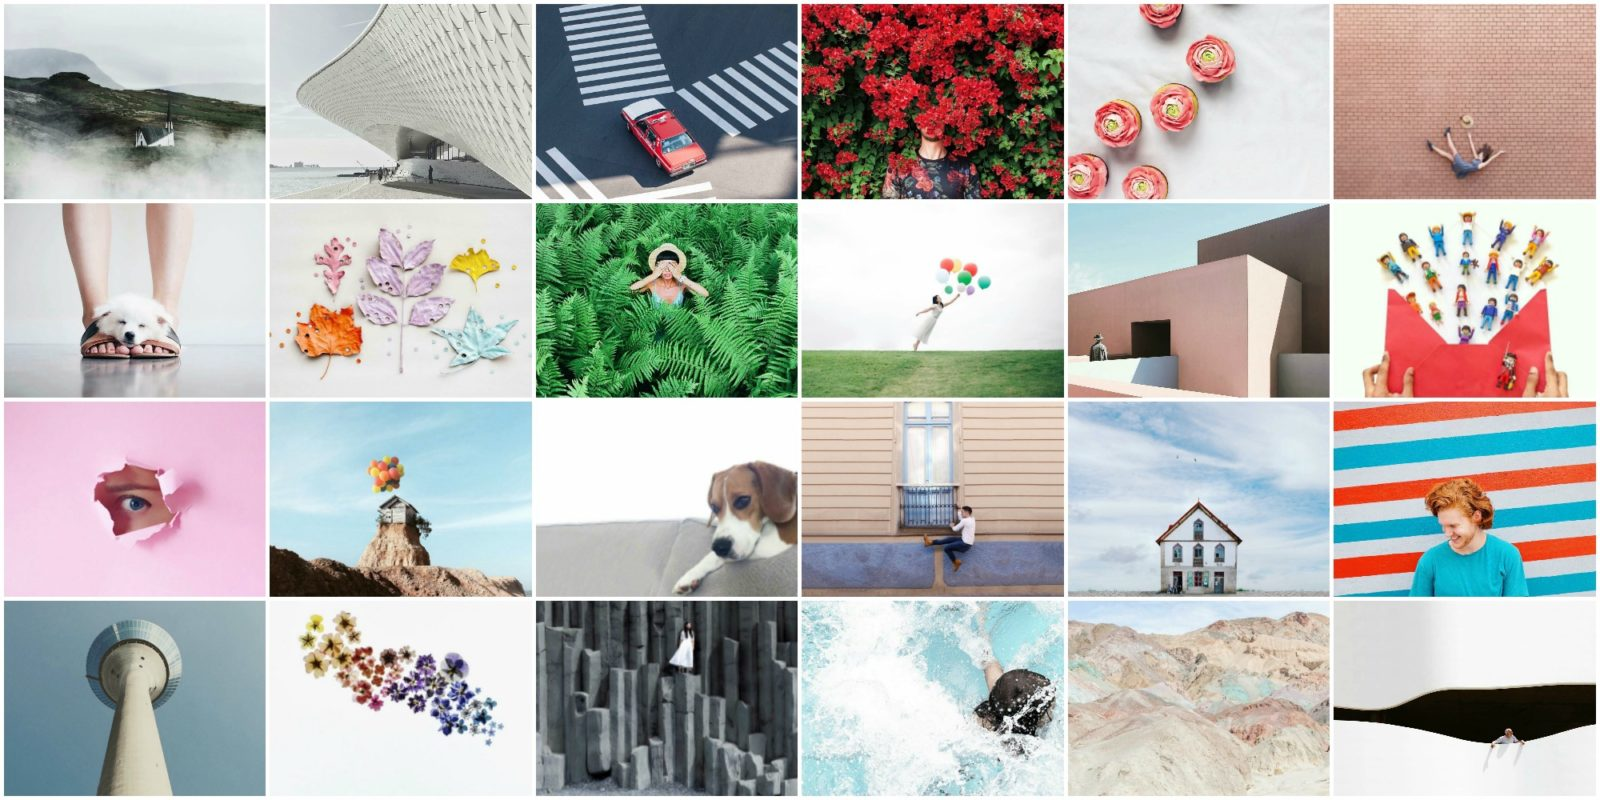 24 inspiring minimalist instagram accounts you should for Minimal art instagram